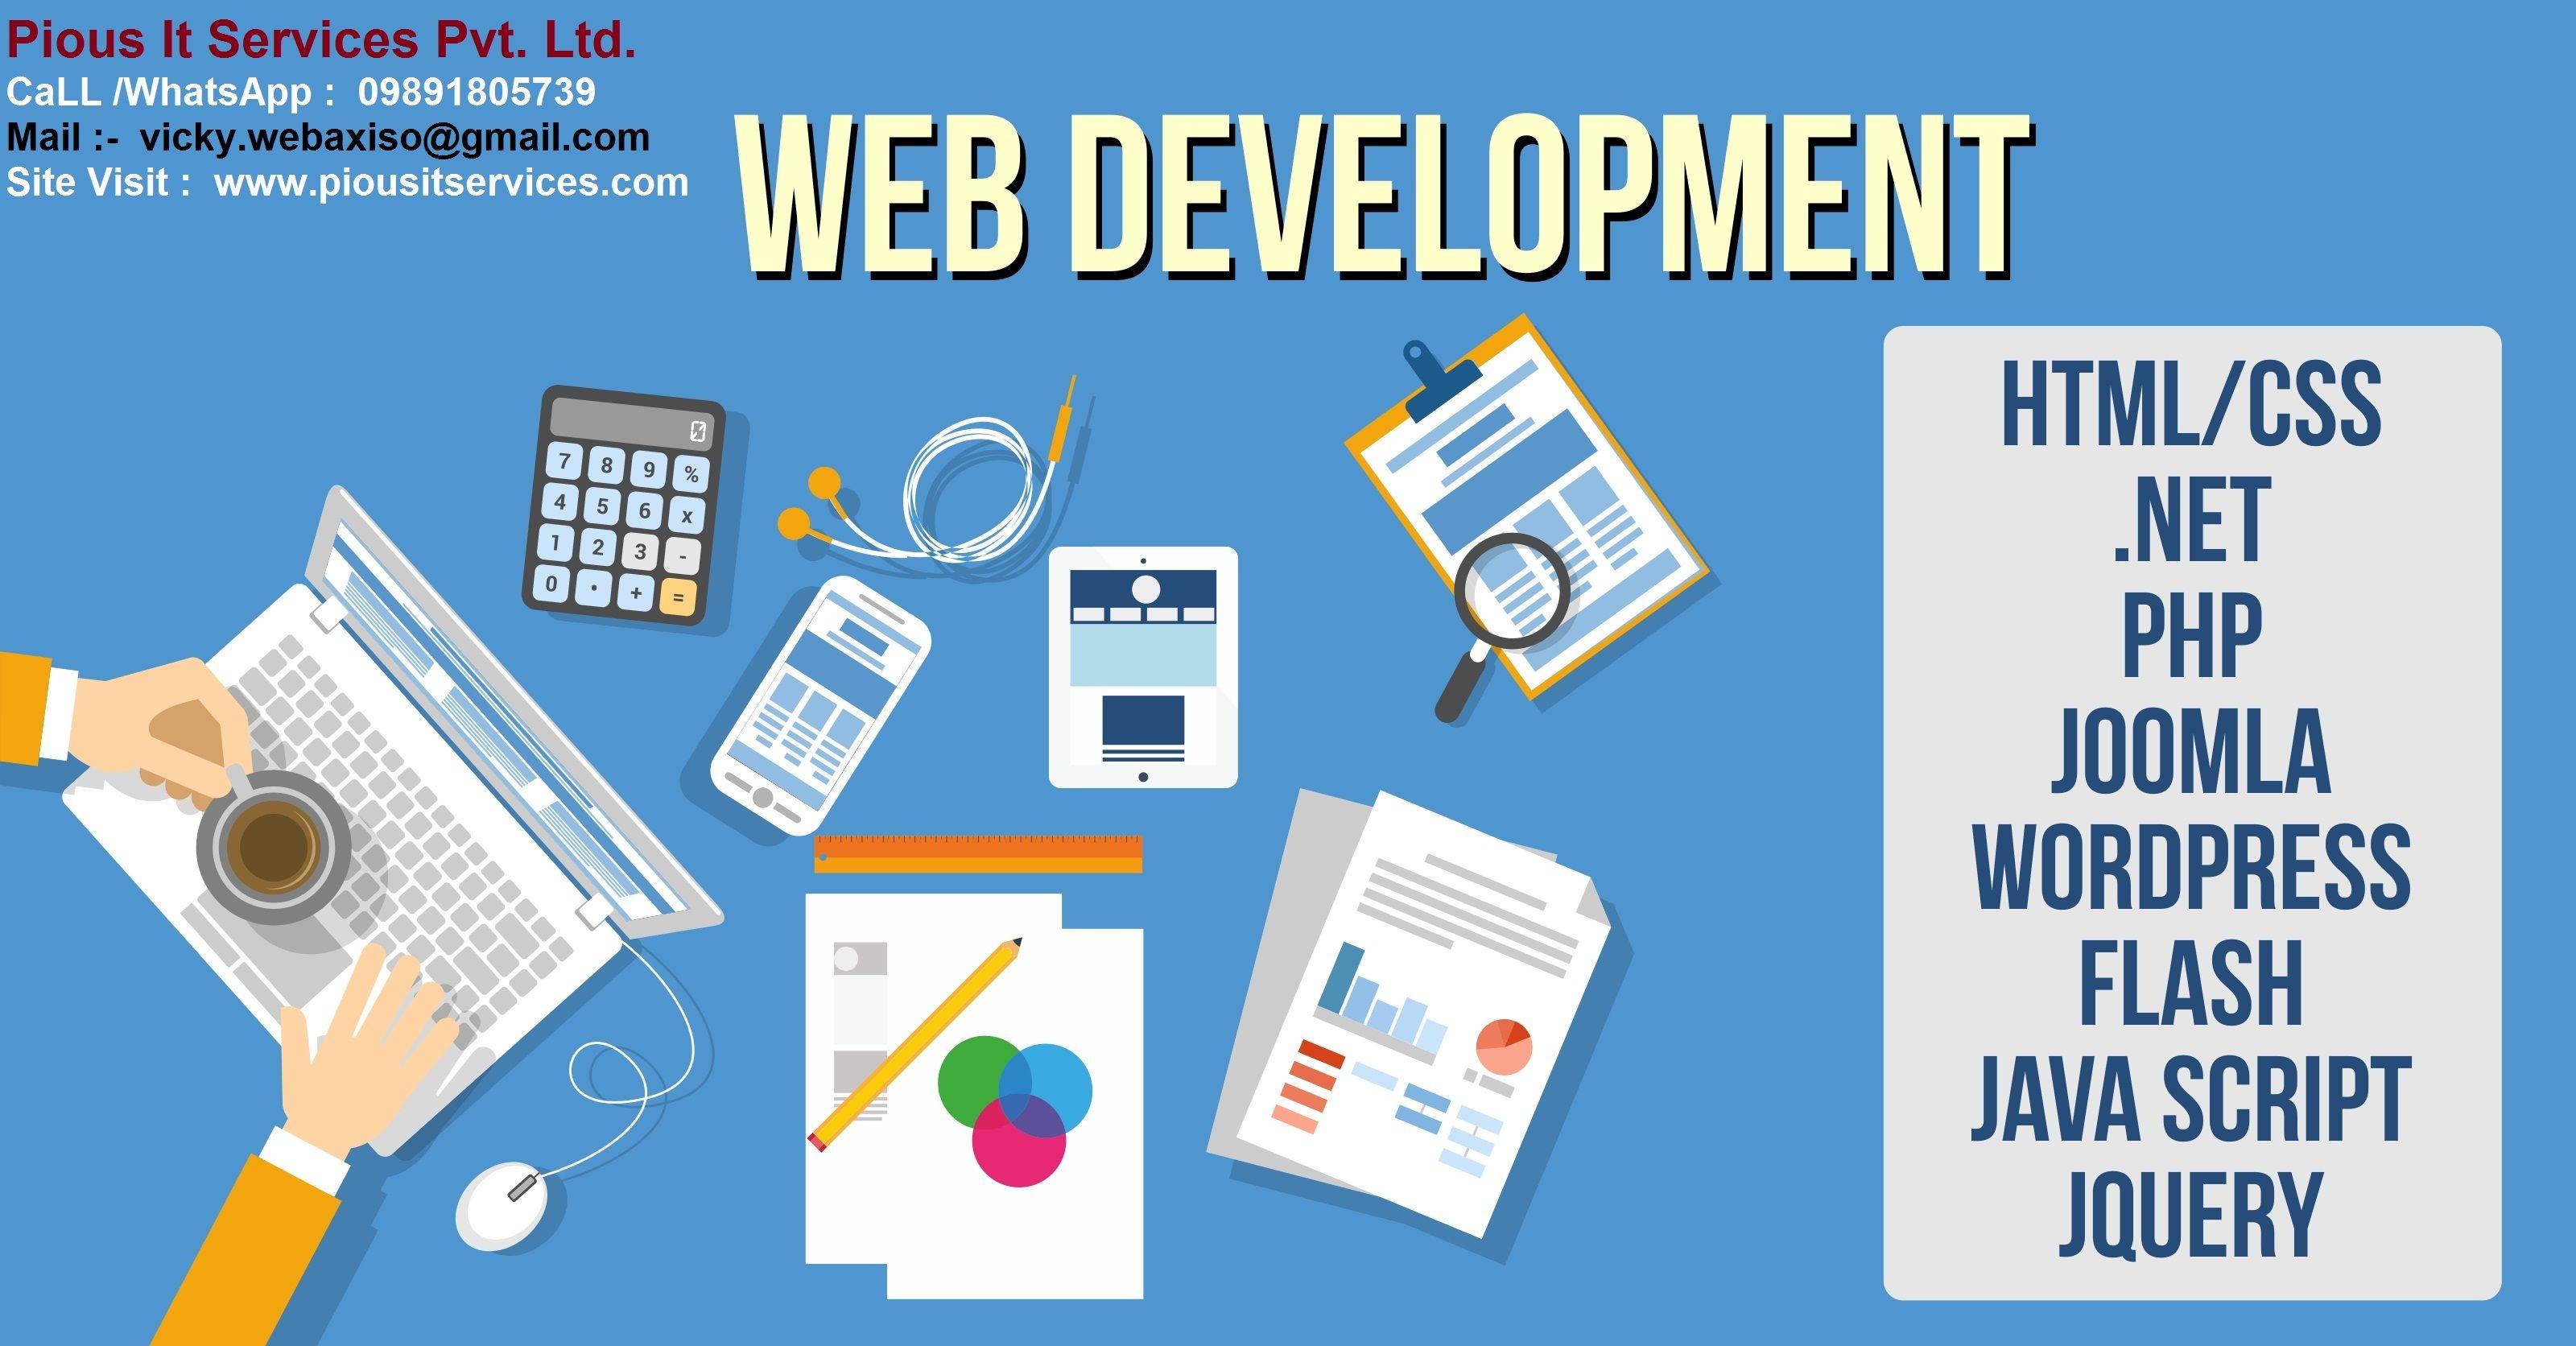 Website Development Company In Ghaziabad Website Development Ghaziabad In 2020 Web Development Web Design Software Web Development Design